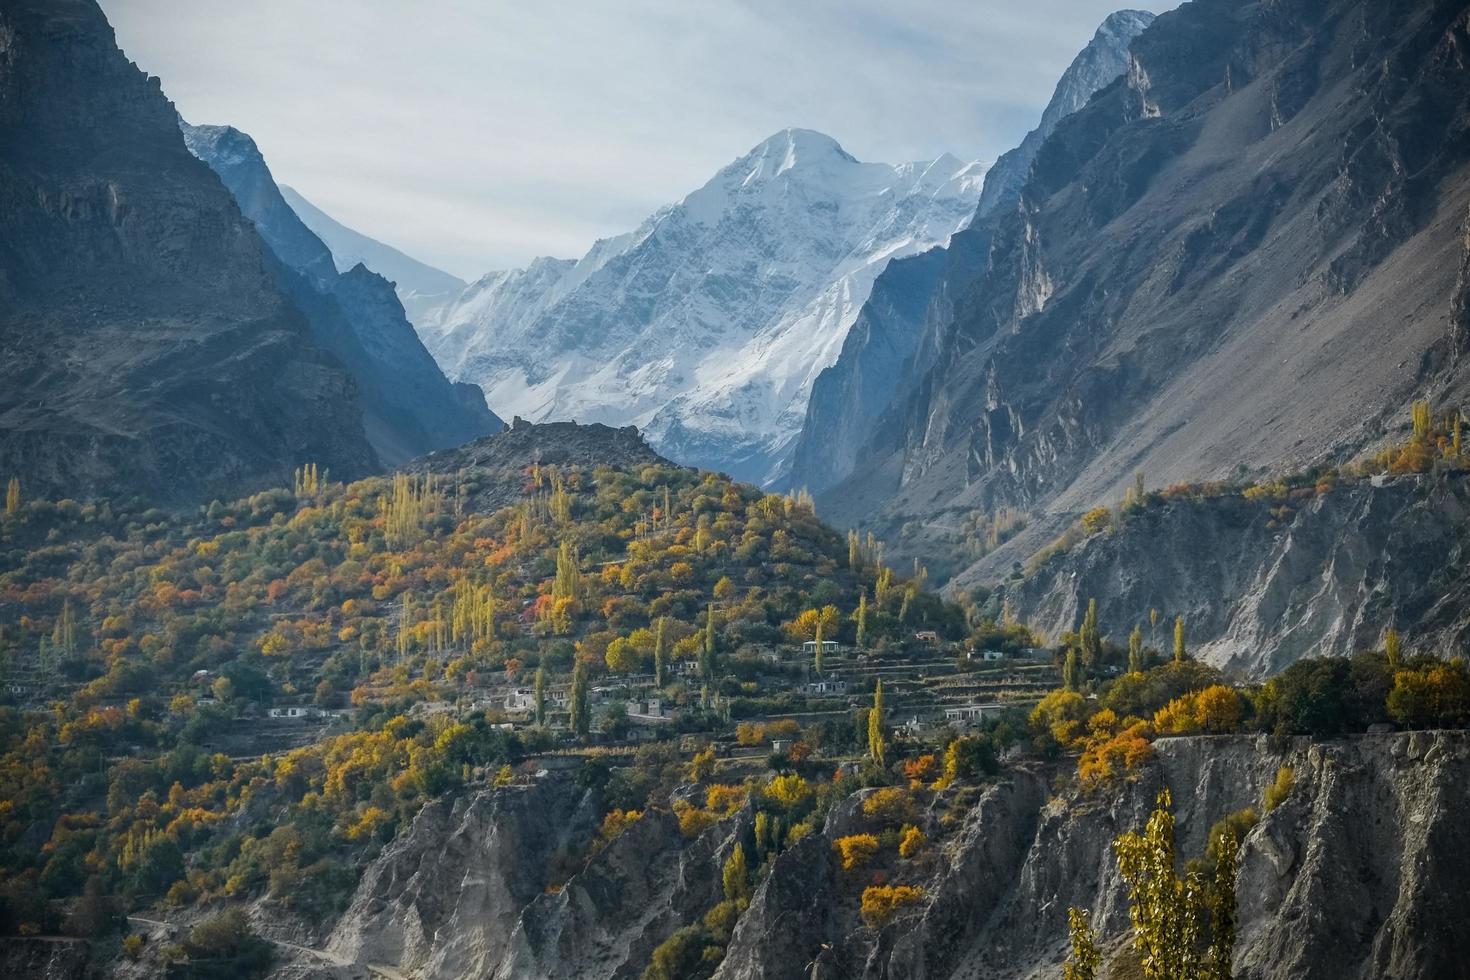 Karakoram-Gebirgszug im Nagar-Tal, Pakistan foto